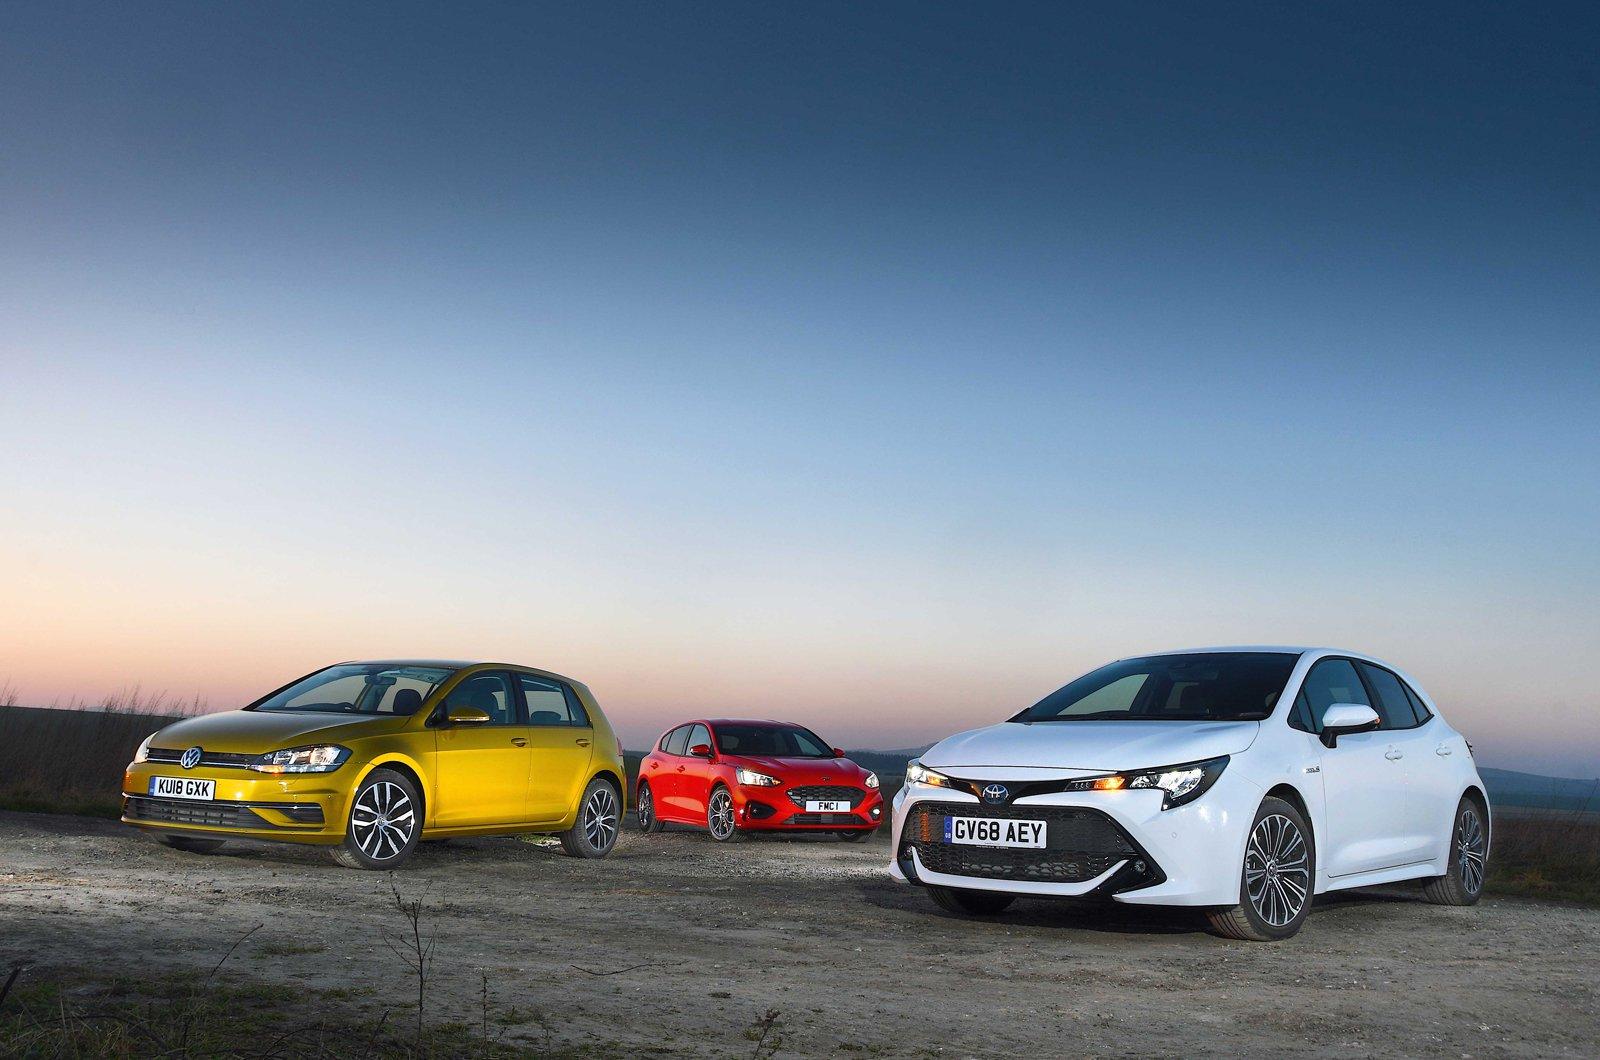 Ford Focus vs Toyota Corolla vs Volkswagen Golf